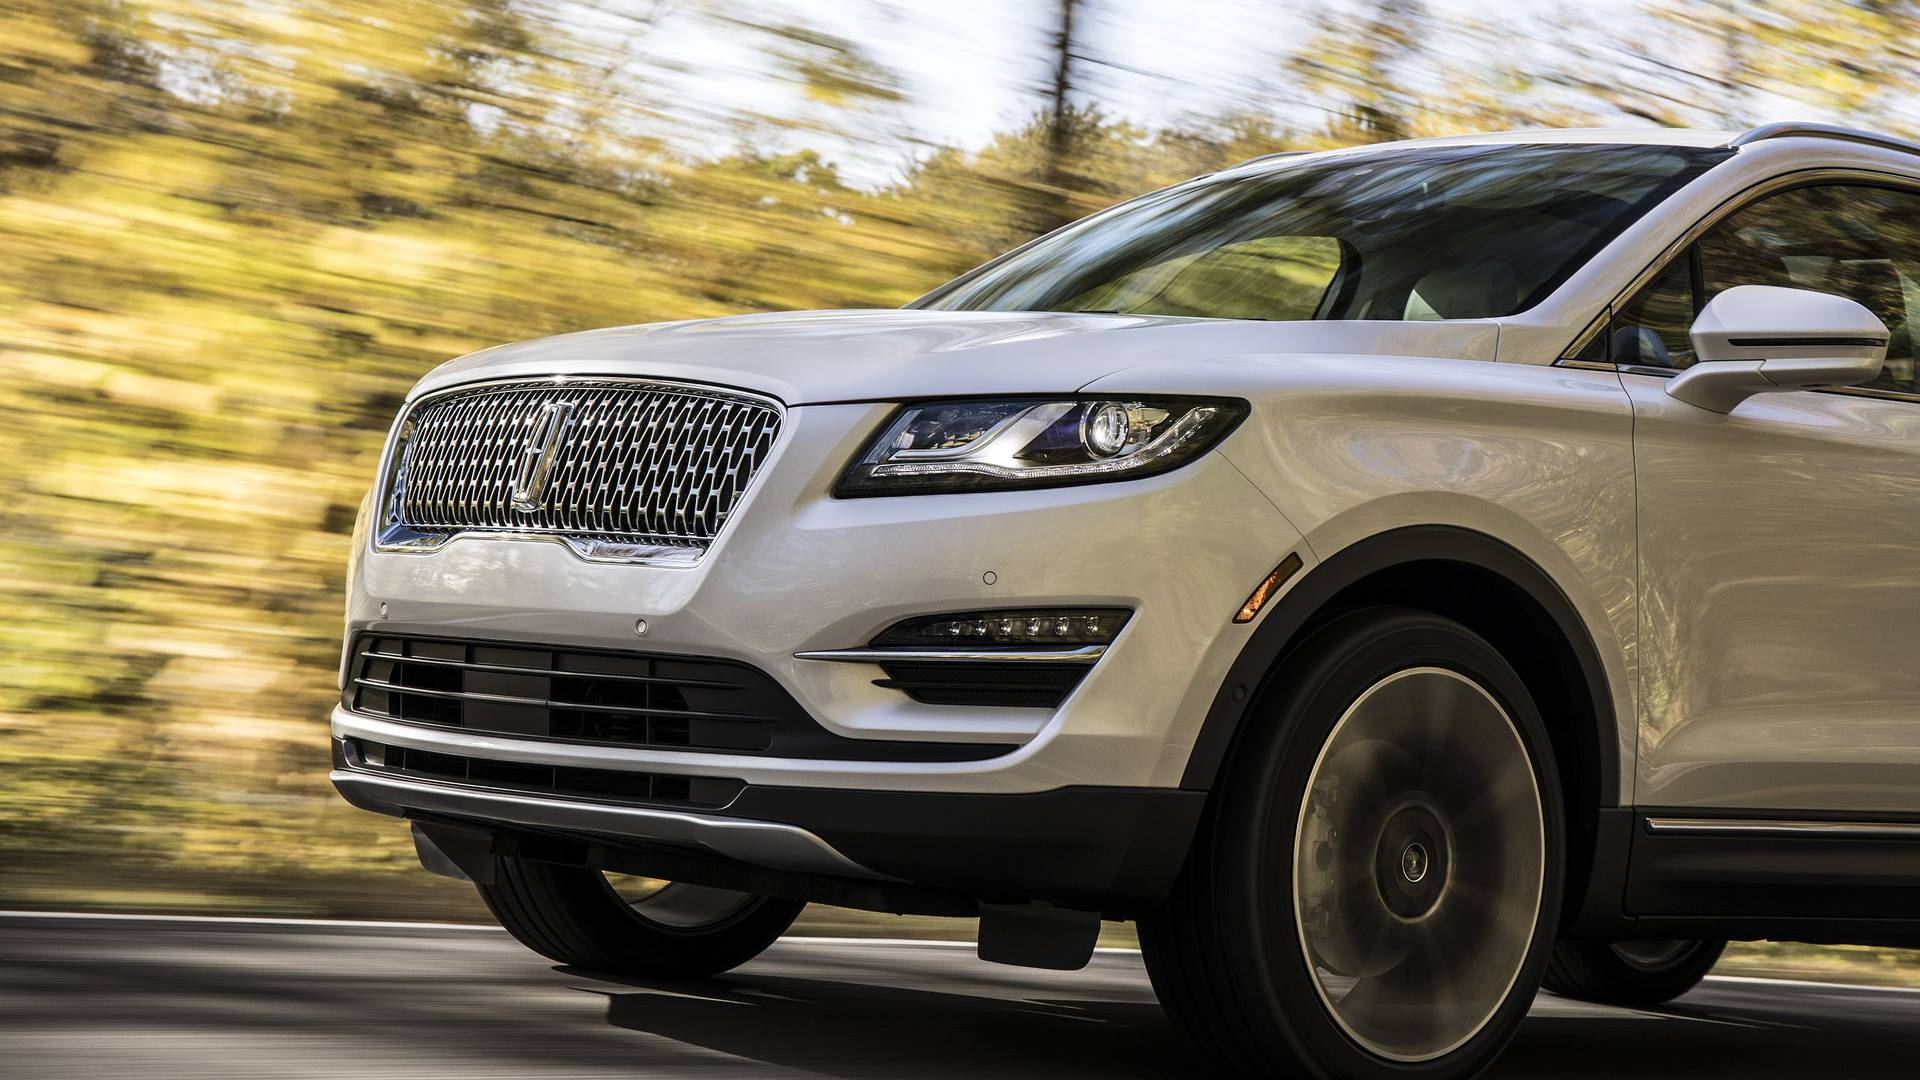 لینکلن MKC Gets A -اجاره ماشین - اجاره خودرو